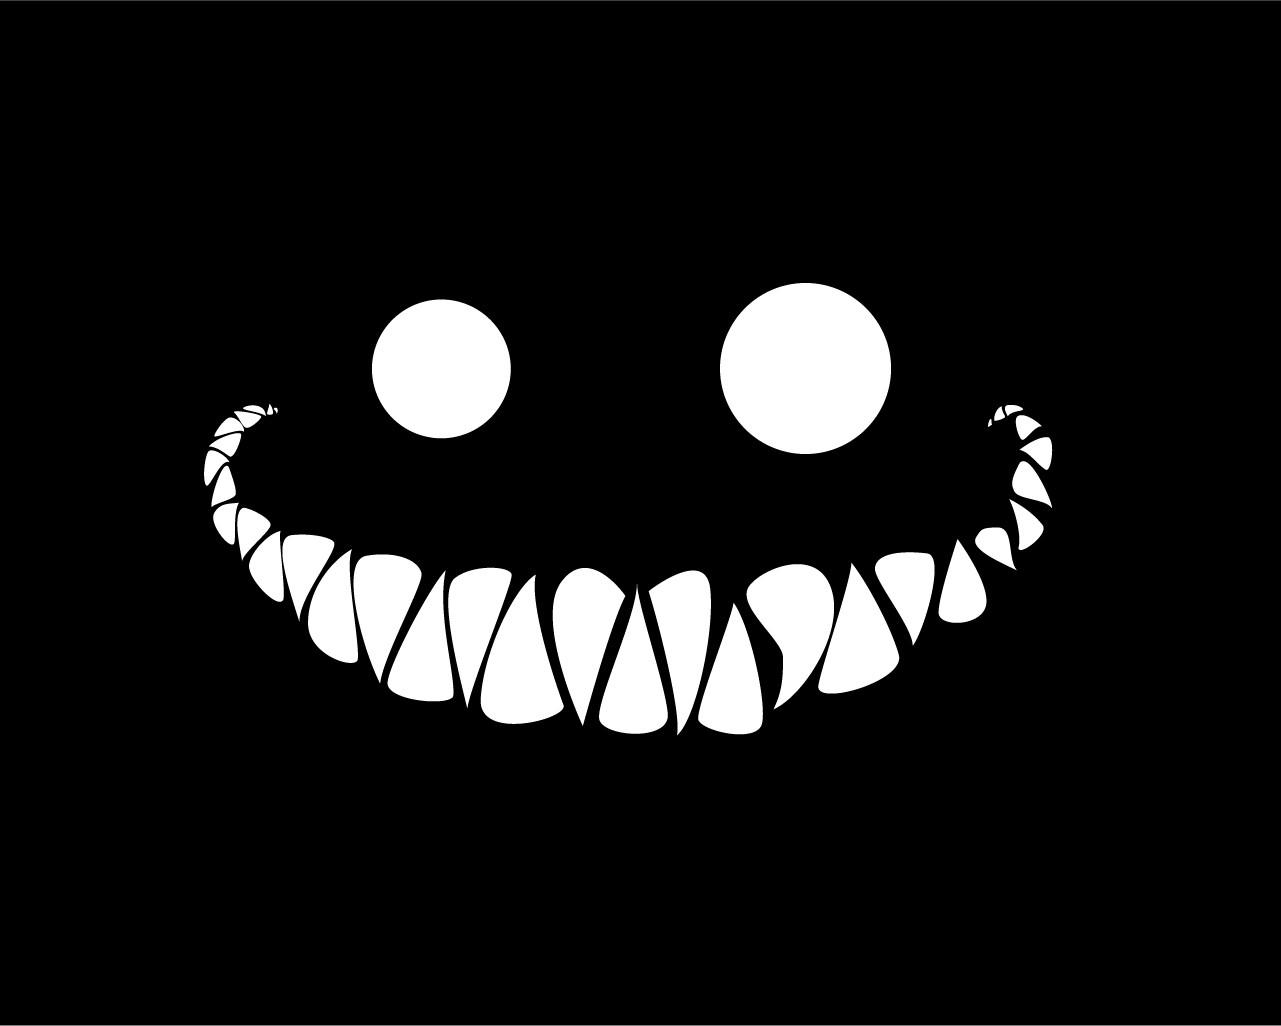 Злобная улыбка картинка